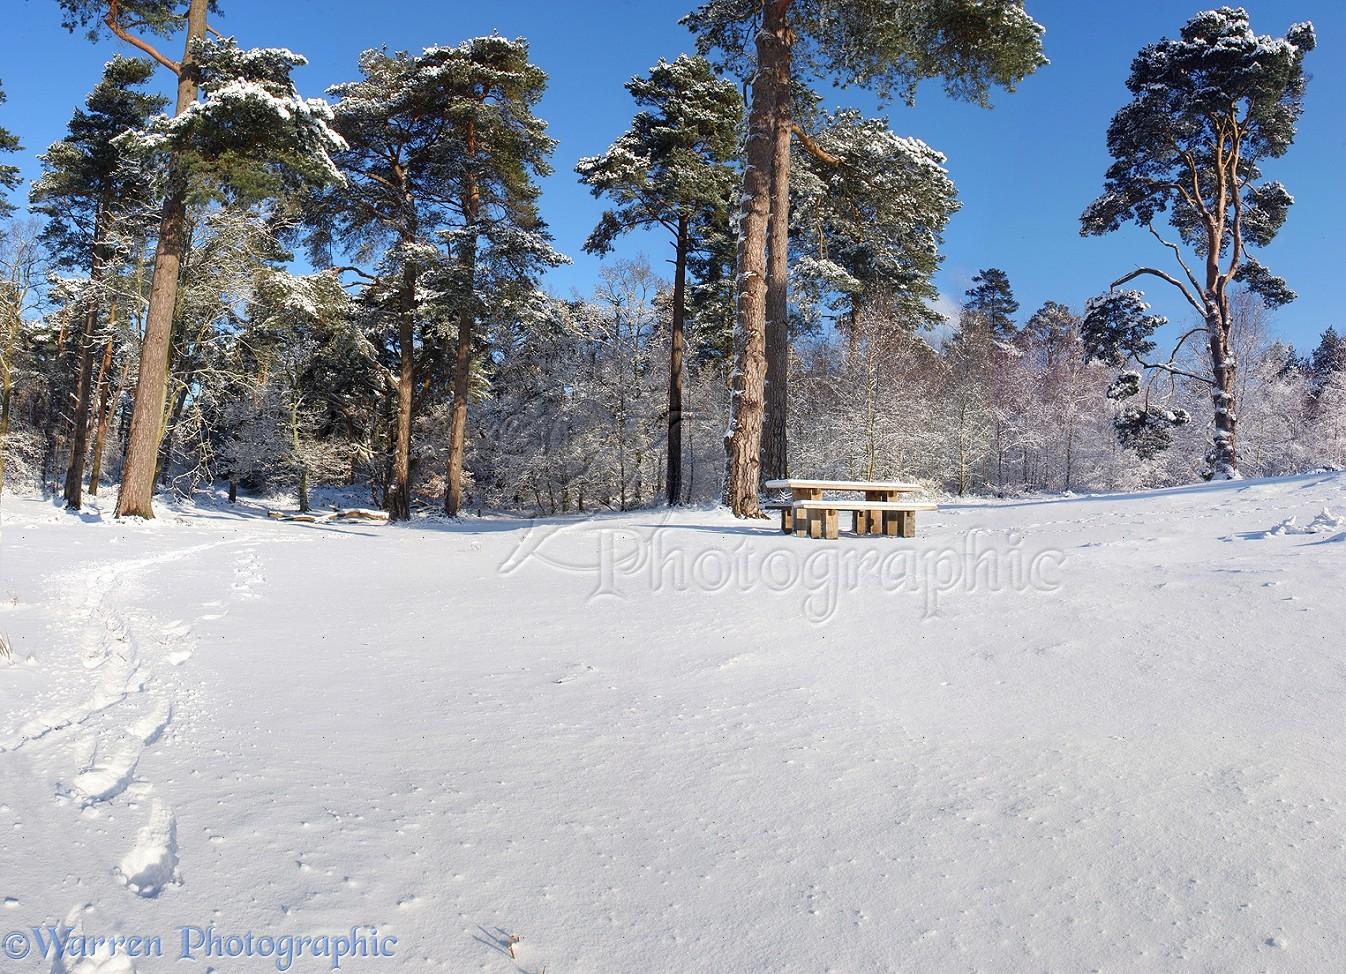 Snowy Scene Photo Wp09151